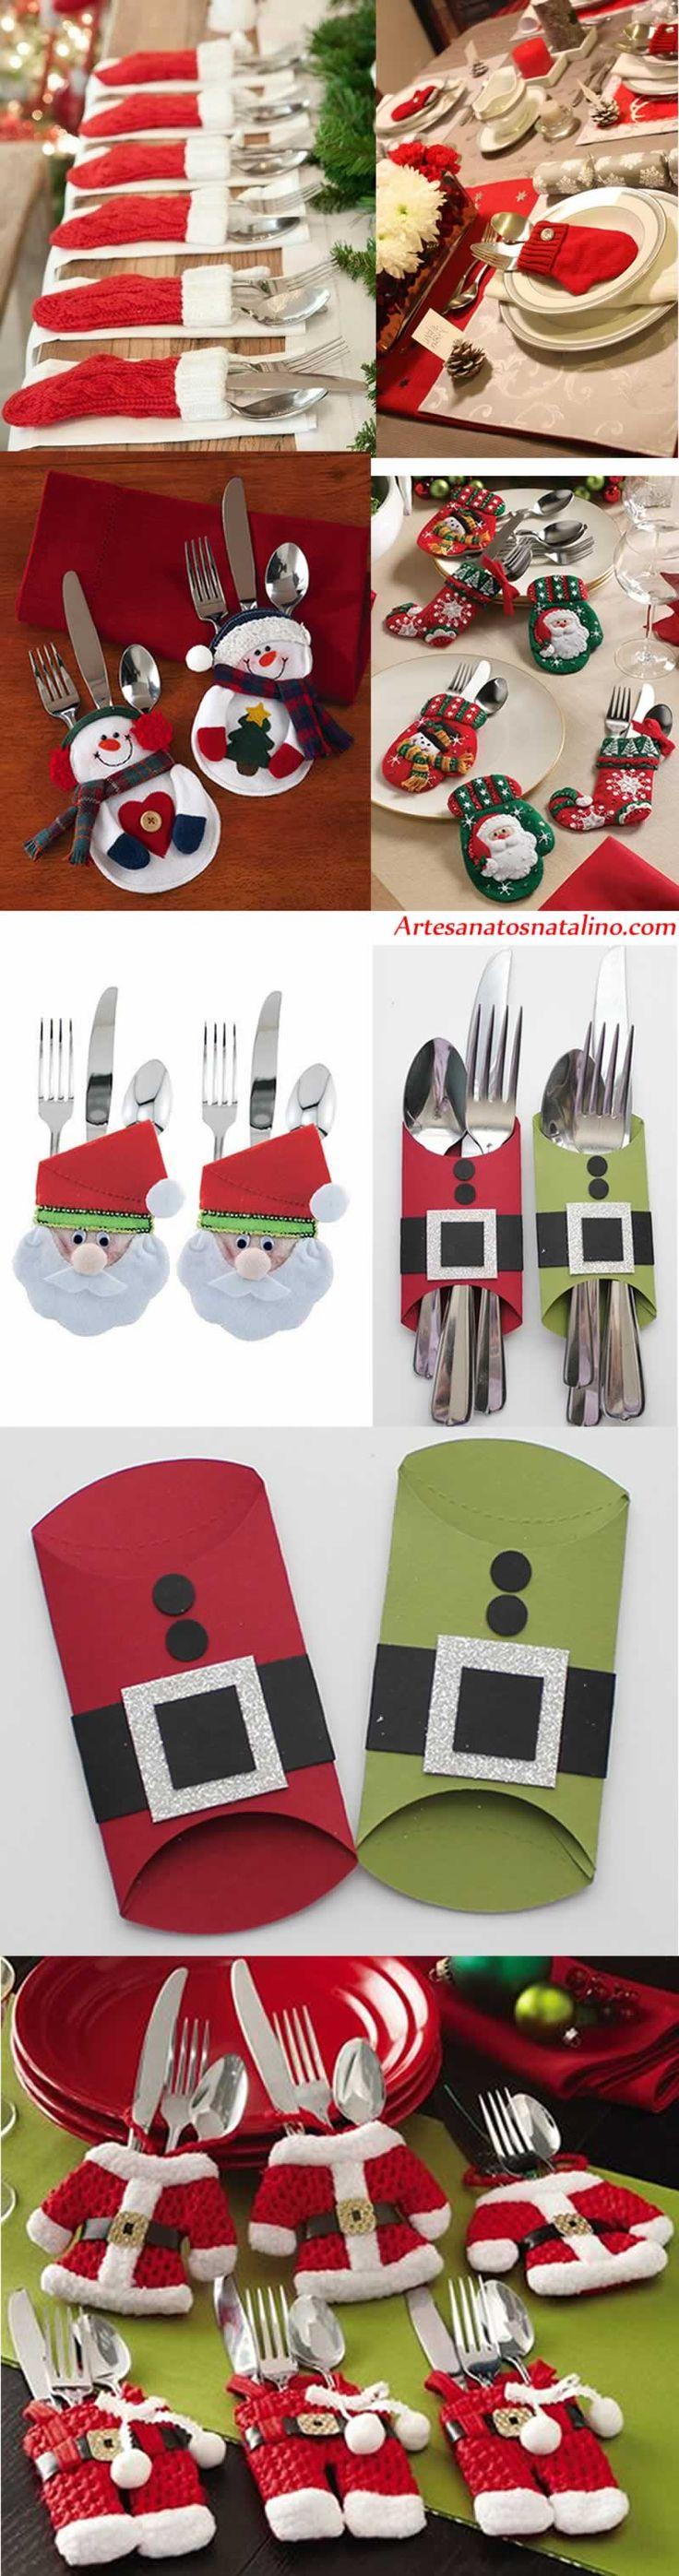 Sugestoes-de-porta-talheres-para-o-natal * Natal / DIY - Blog Pitacos e Achados -  Acesse: https://pitacoseachados.com  – https://www.facebook.com/pitacoseachados – https://www.tsu.co/blogpitacoseachados -  https://plus.google.com/+PitacosAchados-dicas-e-pitacos http://pitacoseachadosblog.tumblr.com #pitacoseachados